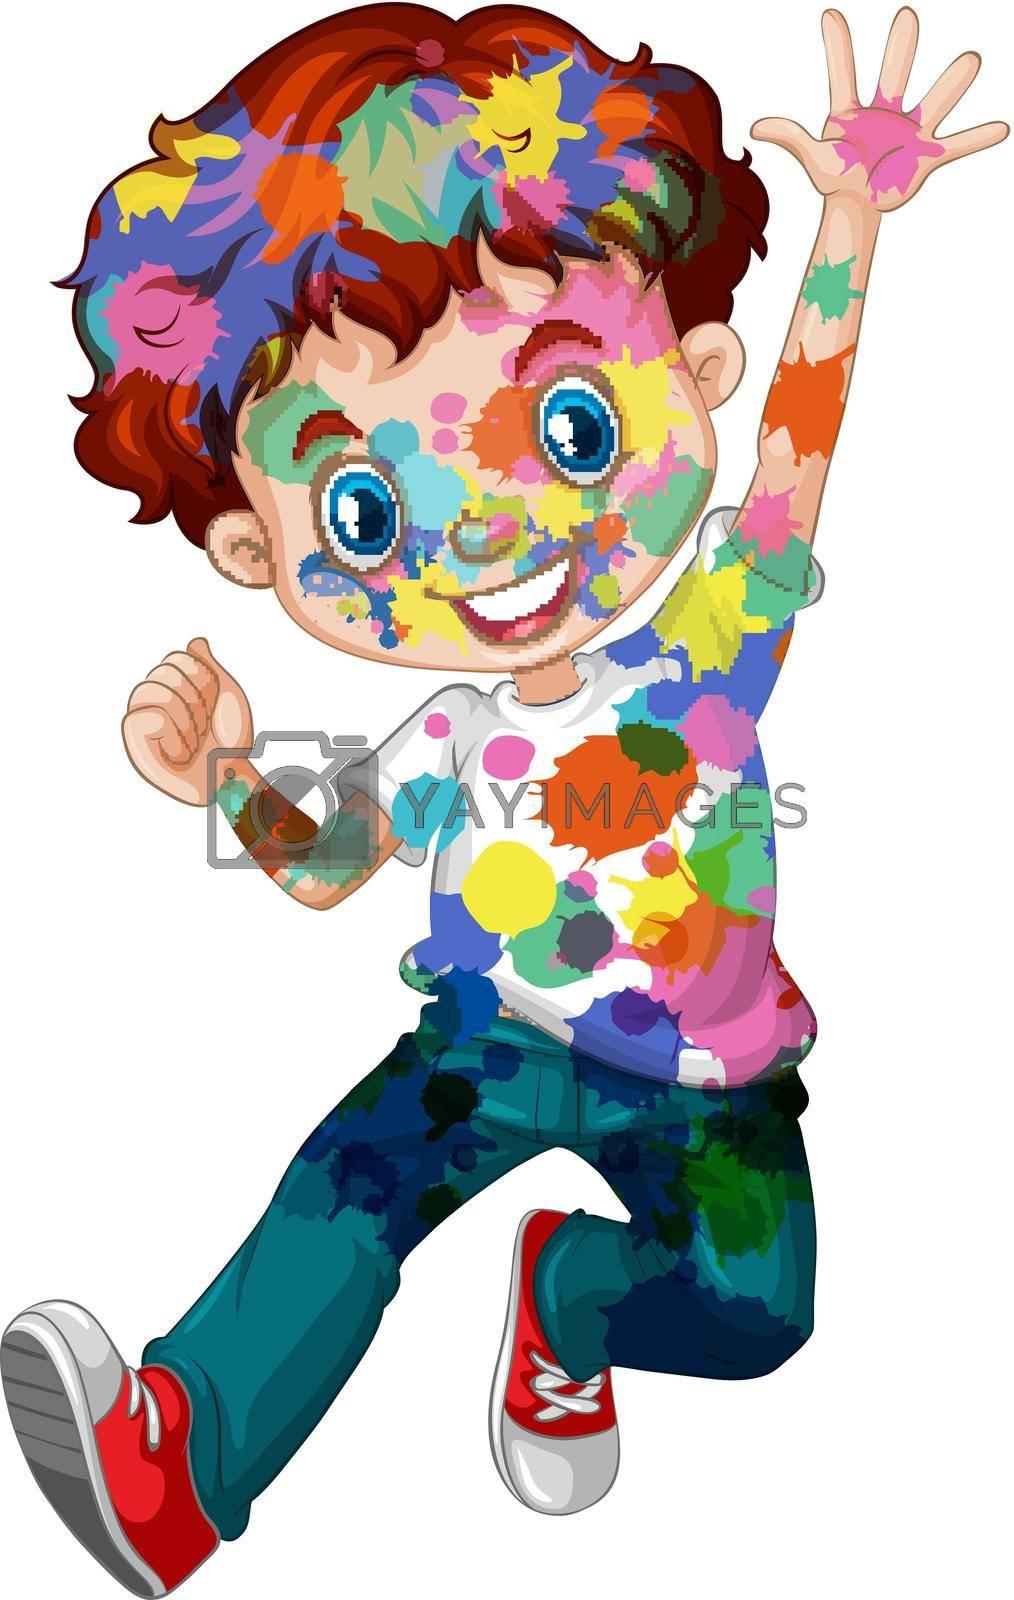 Happy boy with watercolor splash on his body illustration